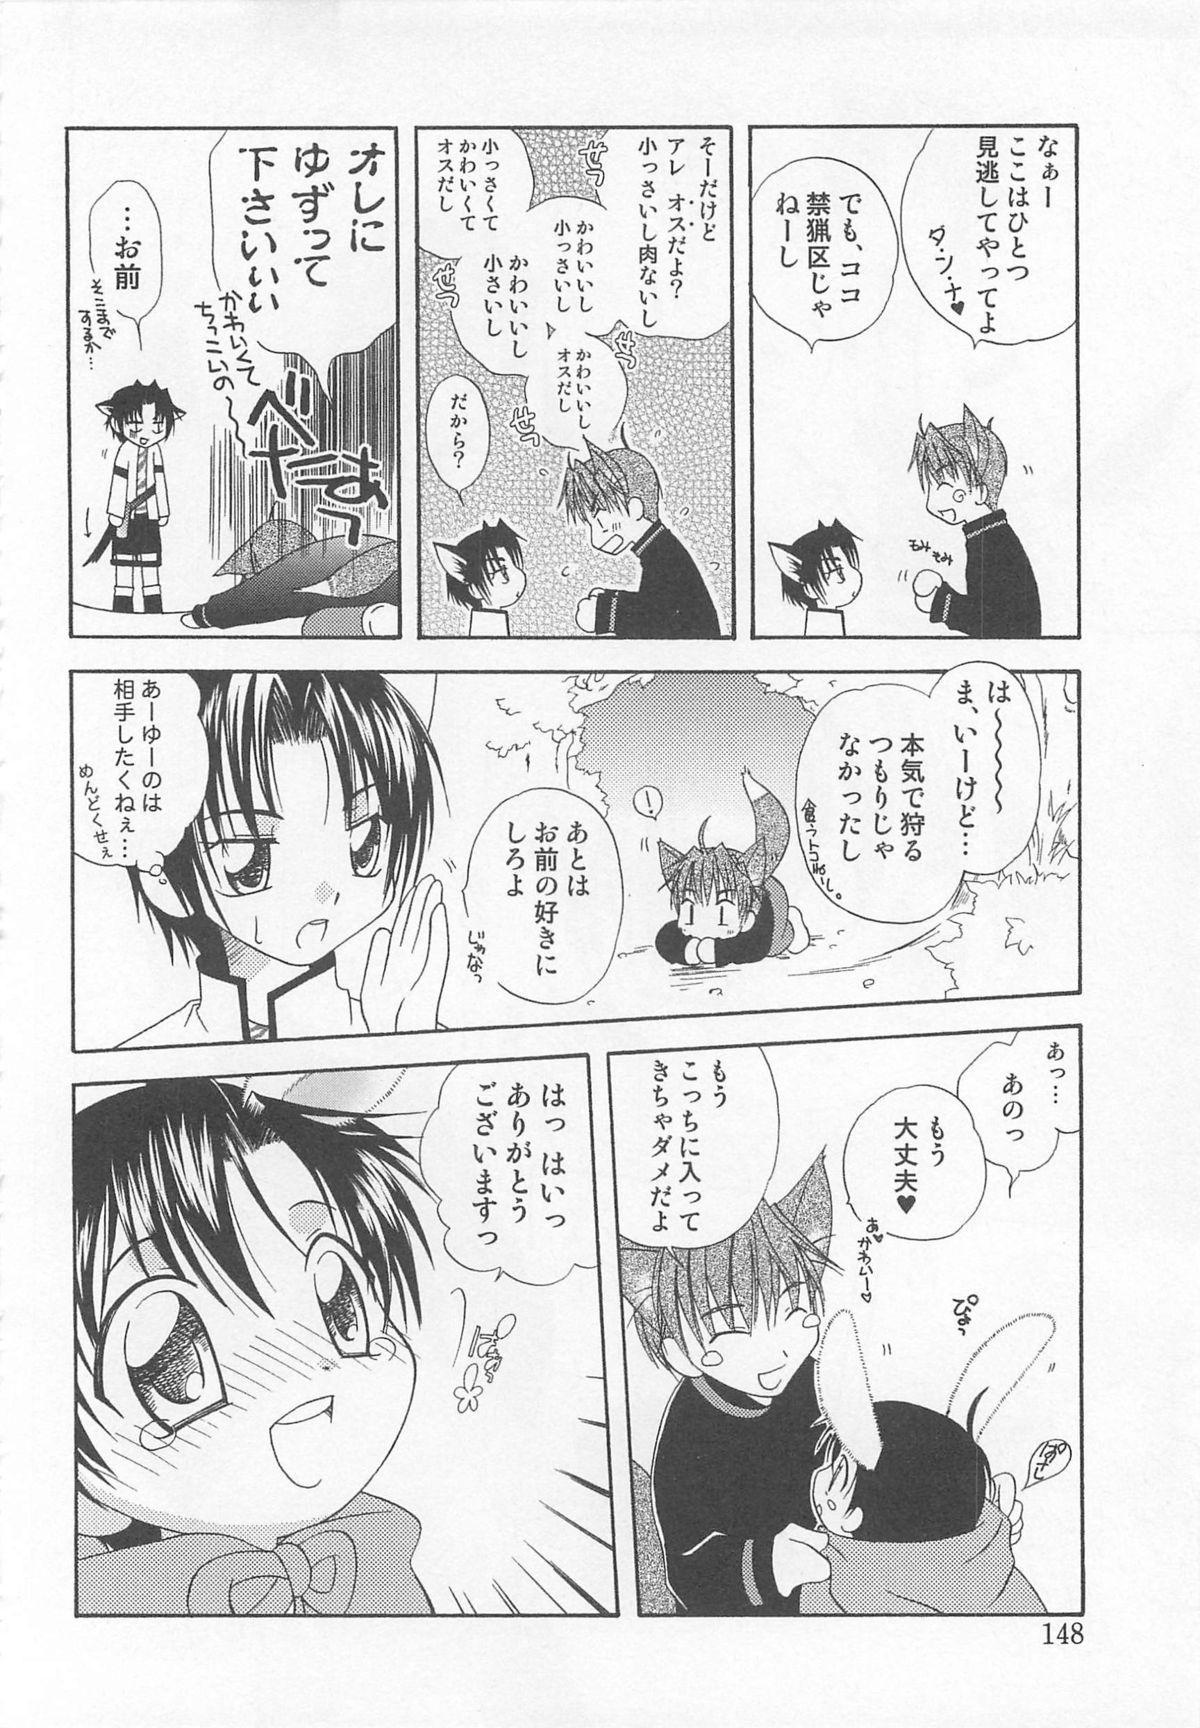 Otokonoko HEAVEN Vol. 02 Dokidoki Chikan Taiken 150